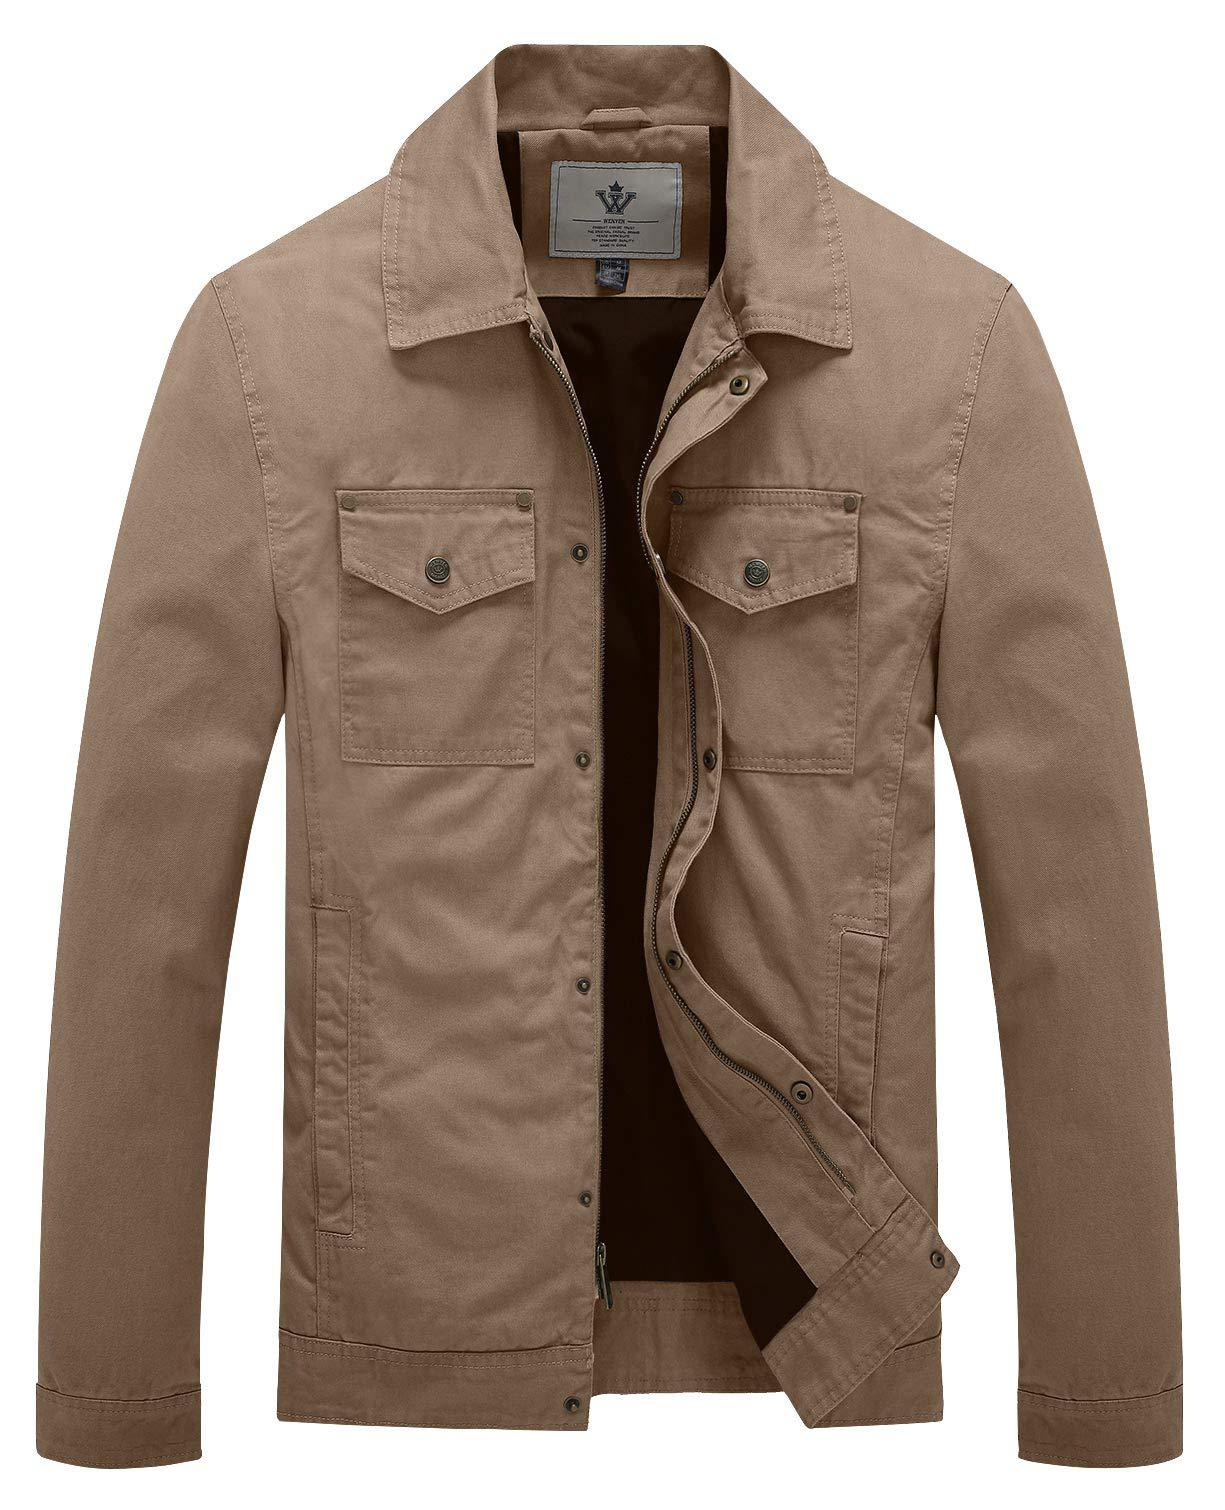 WenVen Men's Spring Military Canavas Cotton Lapel Jacket Windbreaker